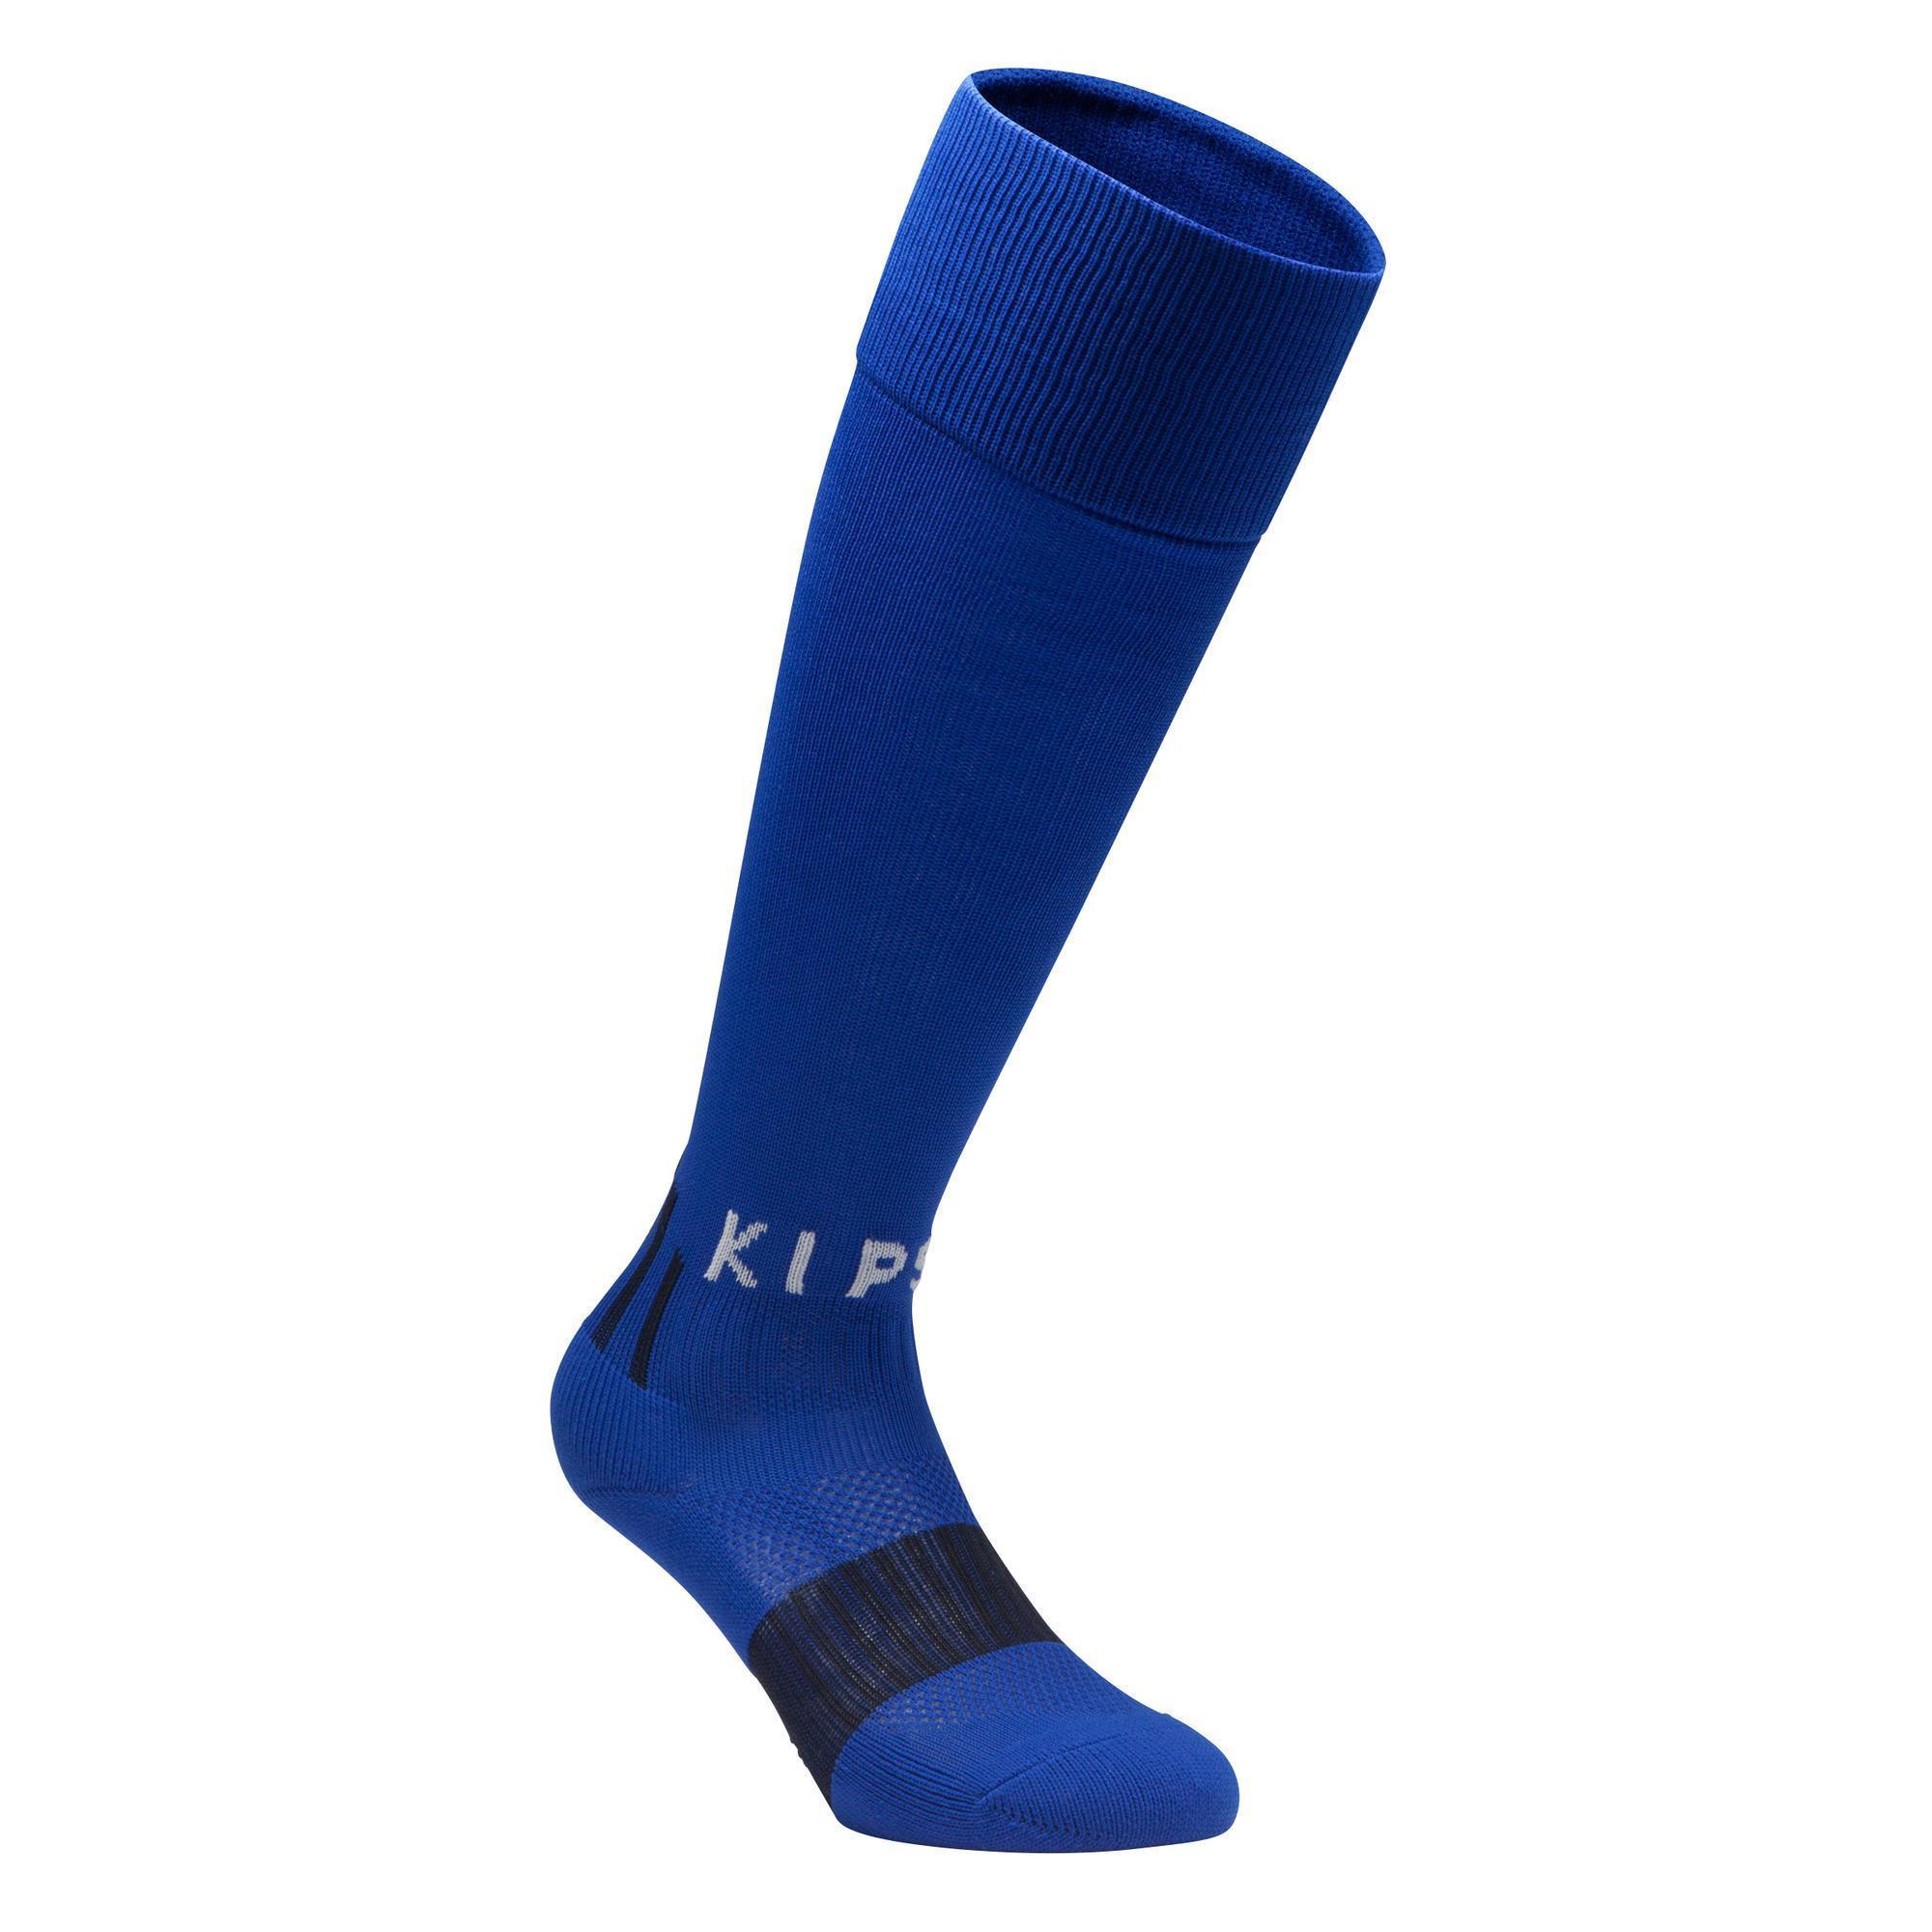 Kipsta Voetbalsokken / voetbalkousen kind F500 blauw